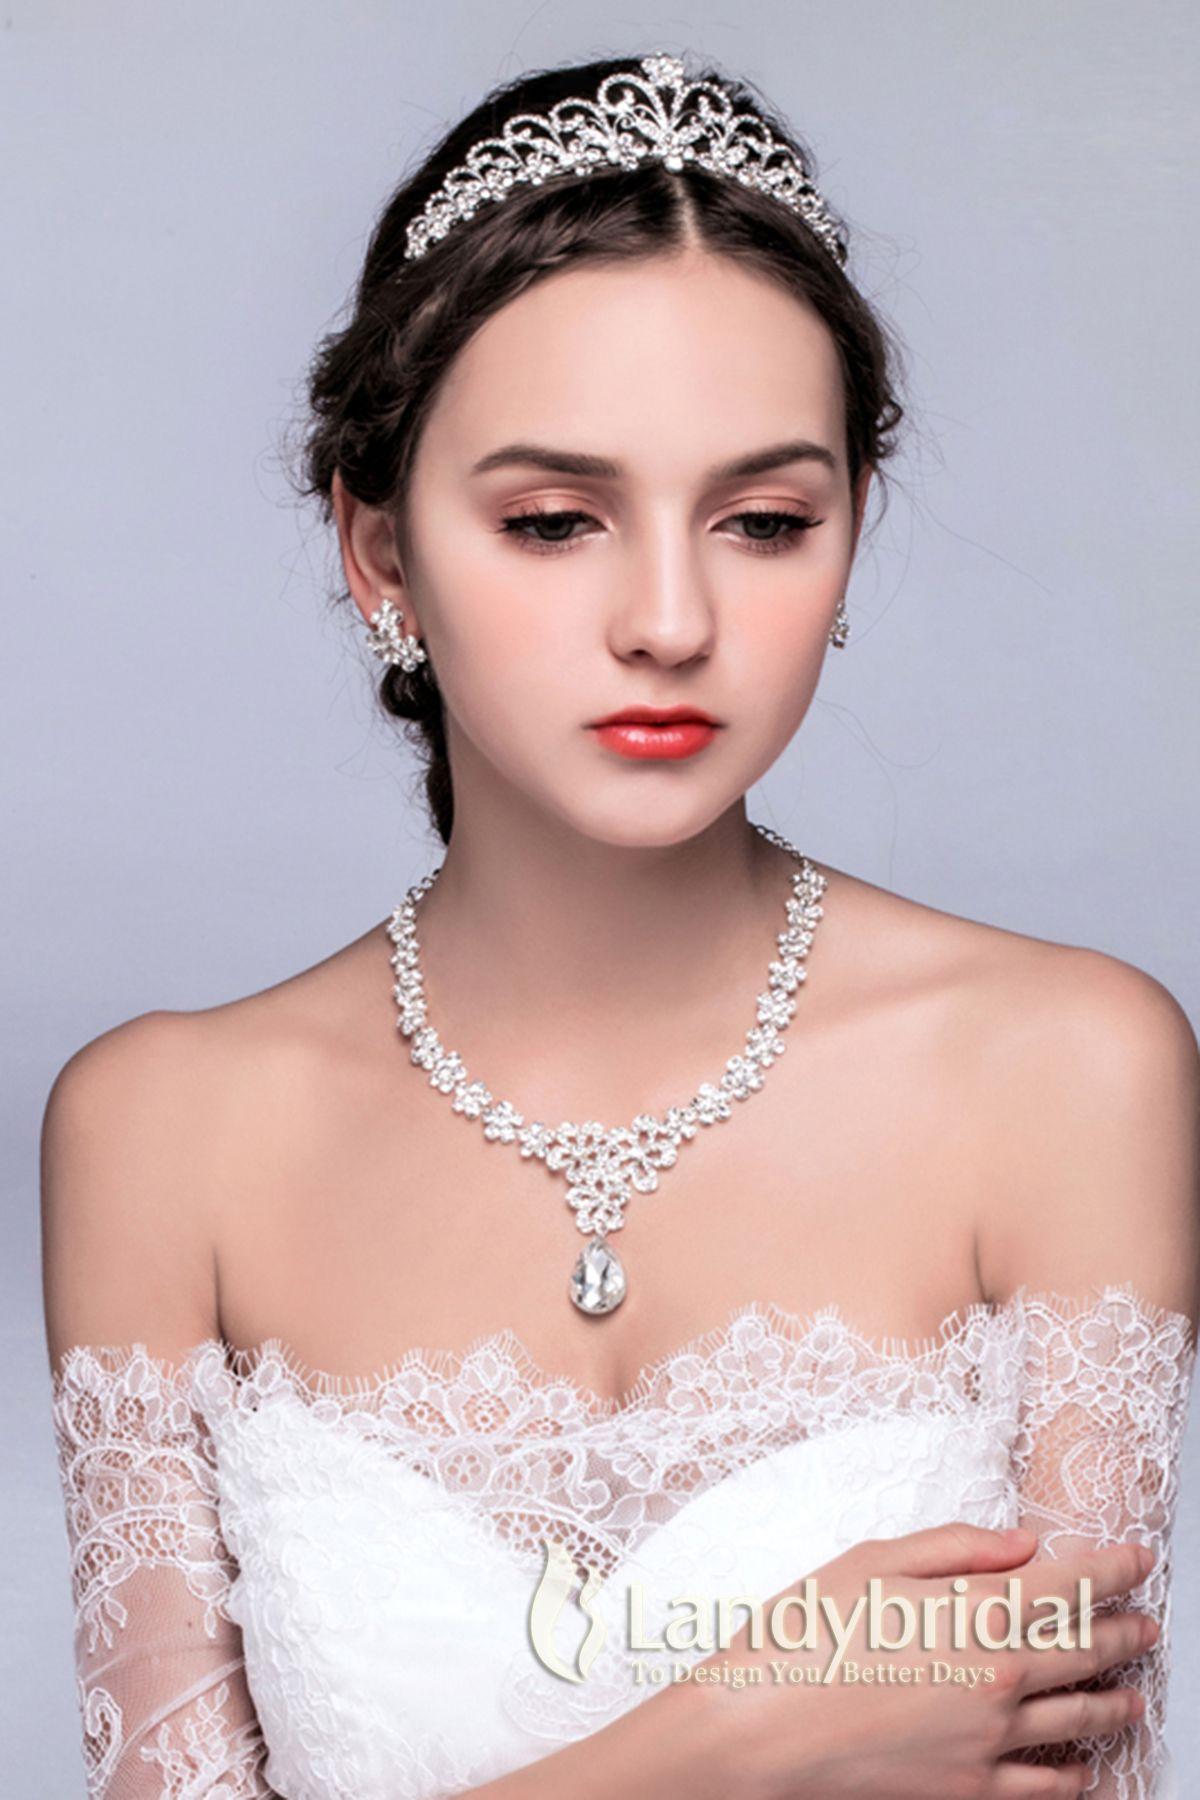 32572d0a85272 アクセサリー ティアラ イヤリング ネックレス 三点セット 豪華なデザイン ウェディング小物 結婚式 花嫁 JJ0015003